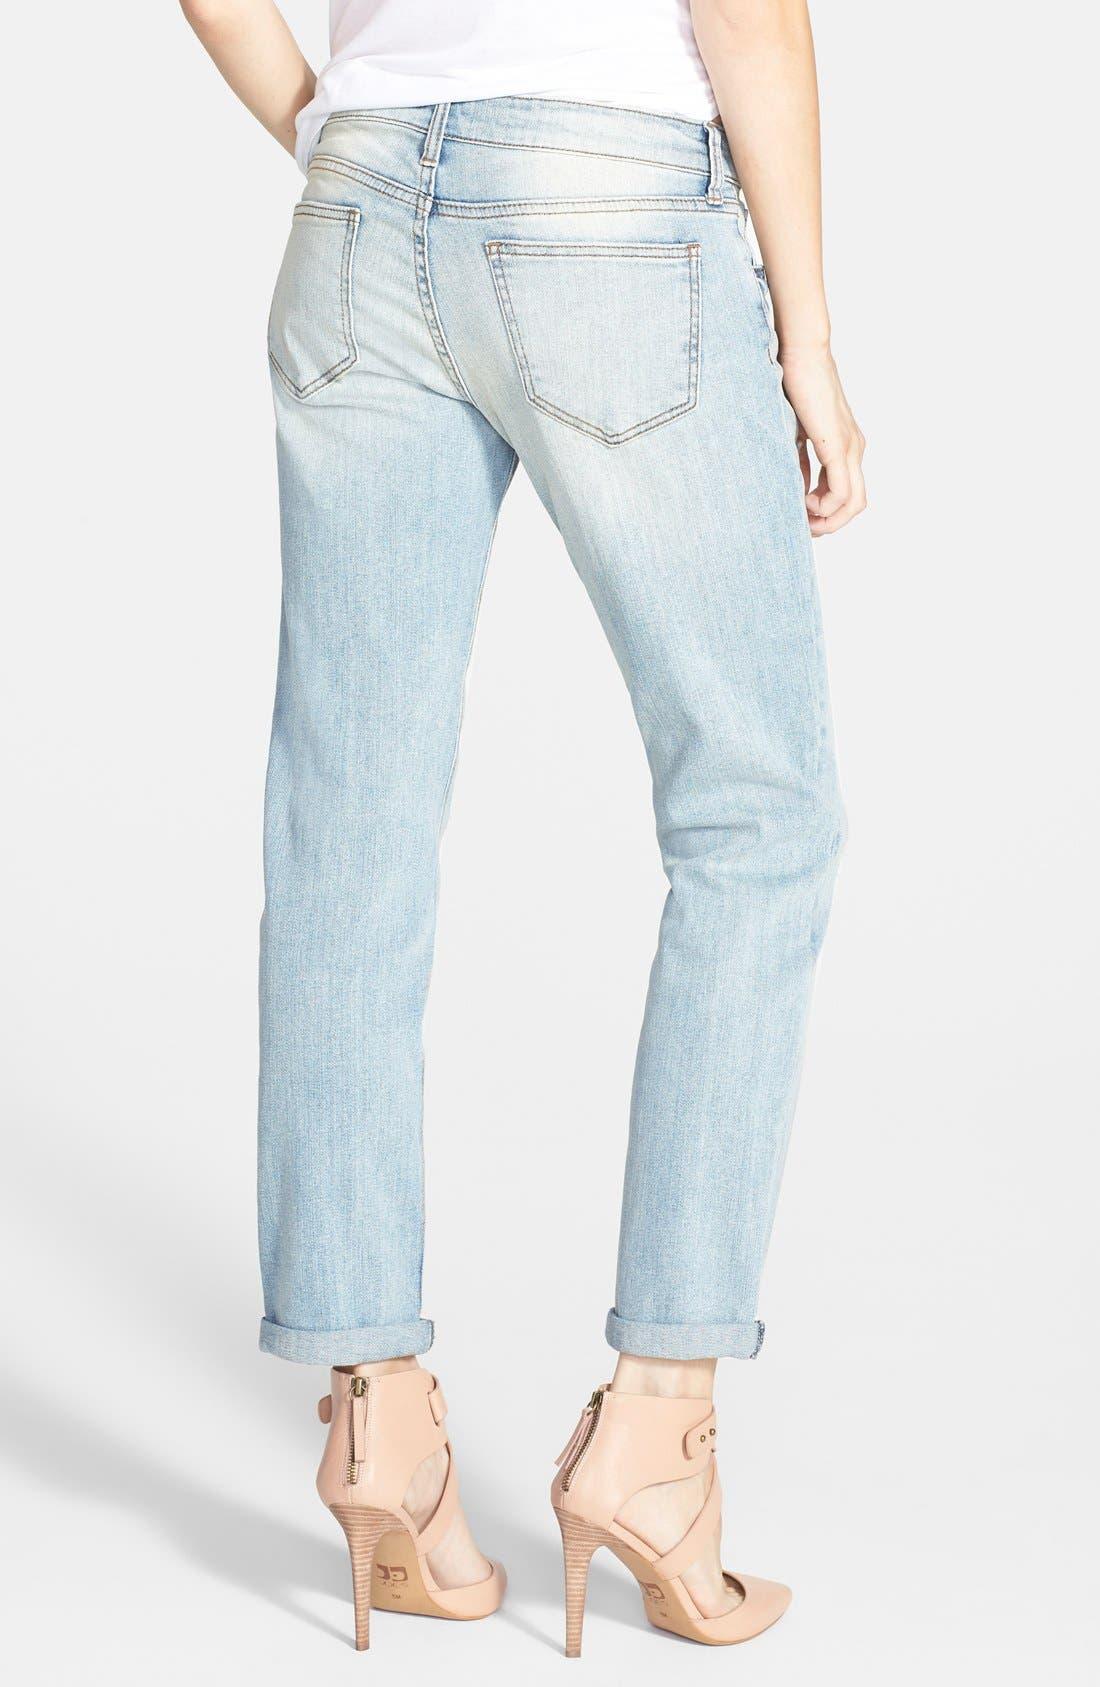 SUN & SHADOW,                             Destroyed Boyfriend Jeans,                             Alternate thumbnail 2, color,                             450